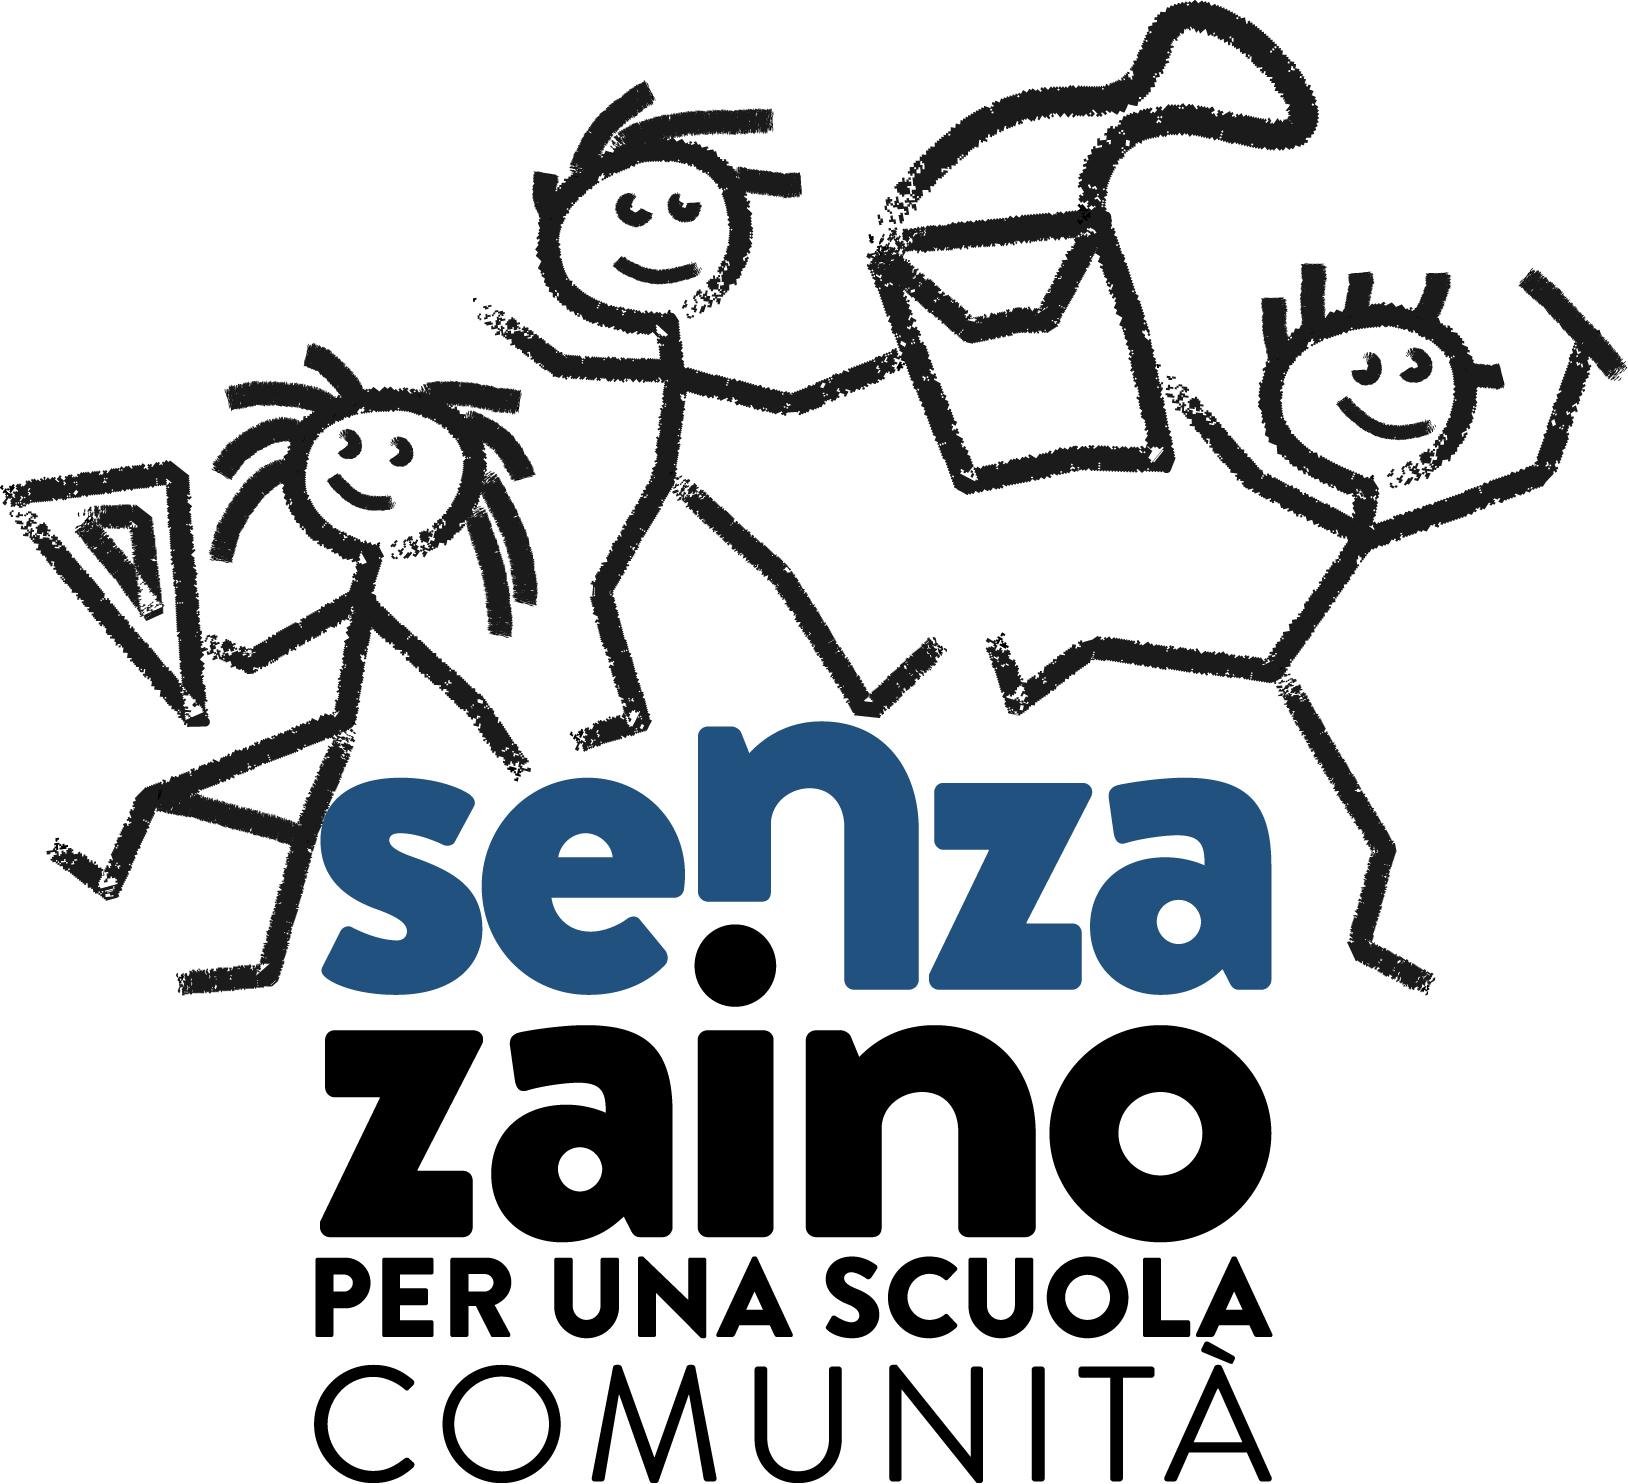 Senza Zaino